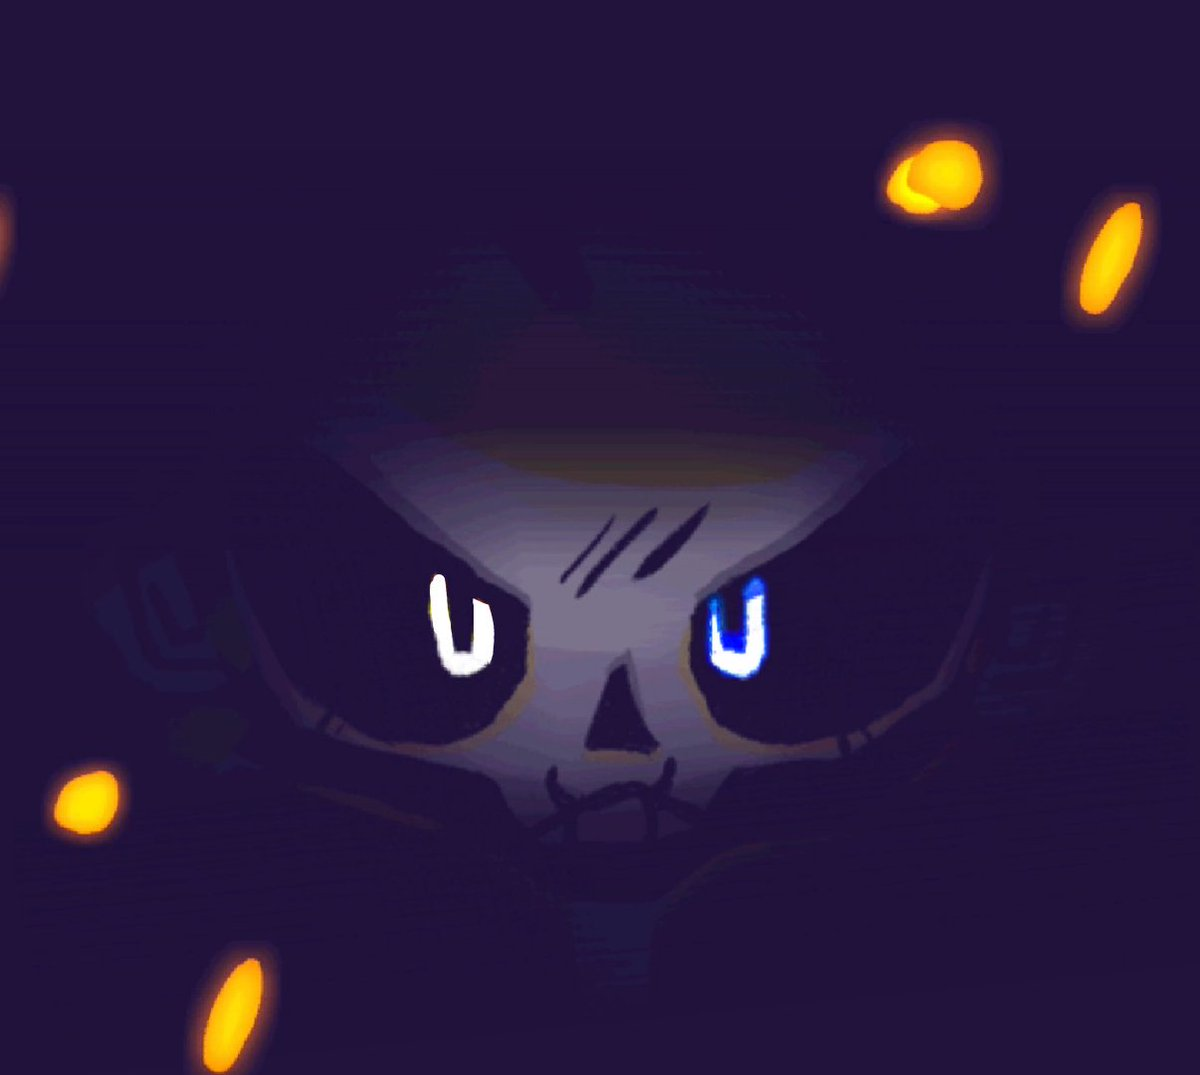 Ninja Kiwi Games on Twitter: